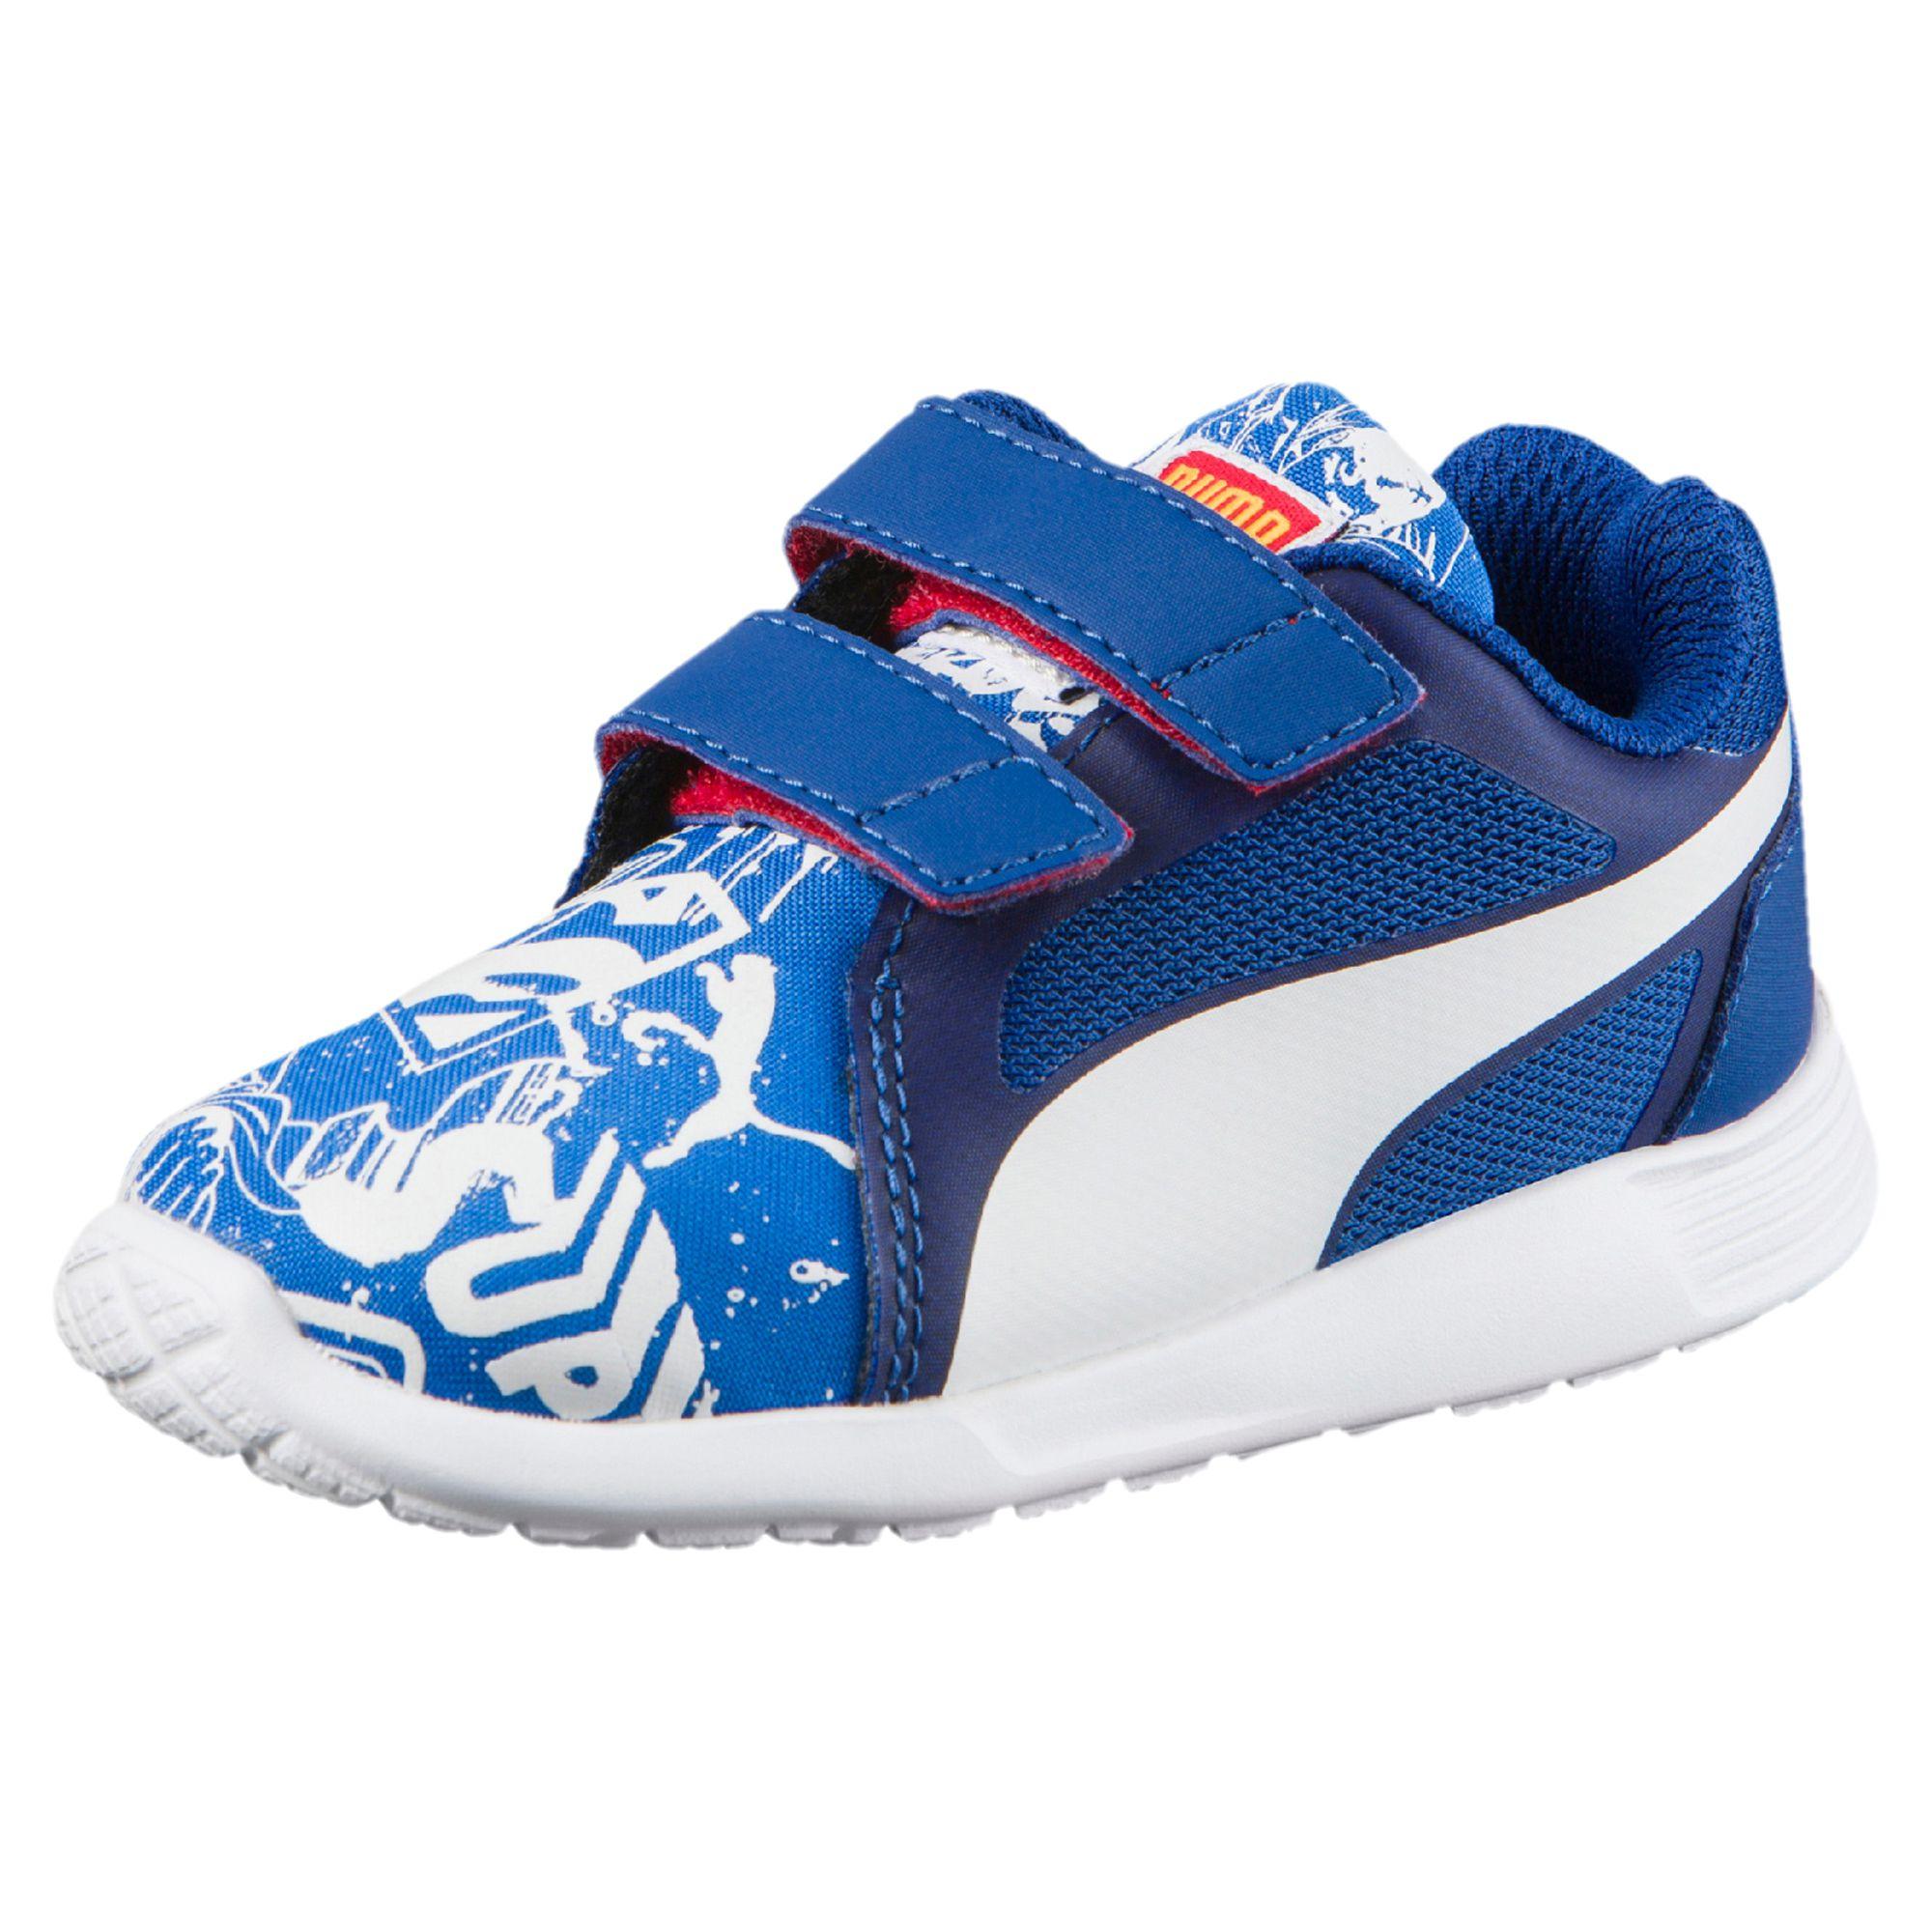 ST тренер Evo Superman™ Baby Street кроссовки